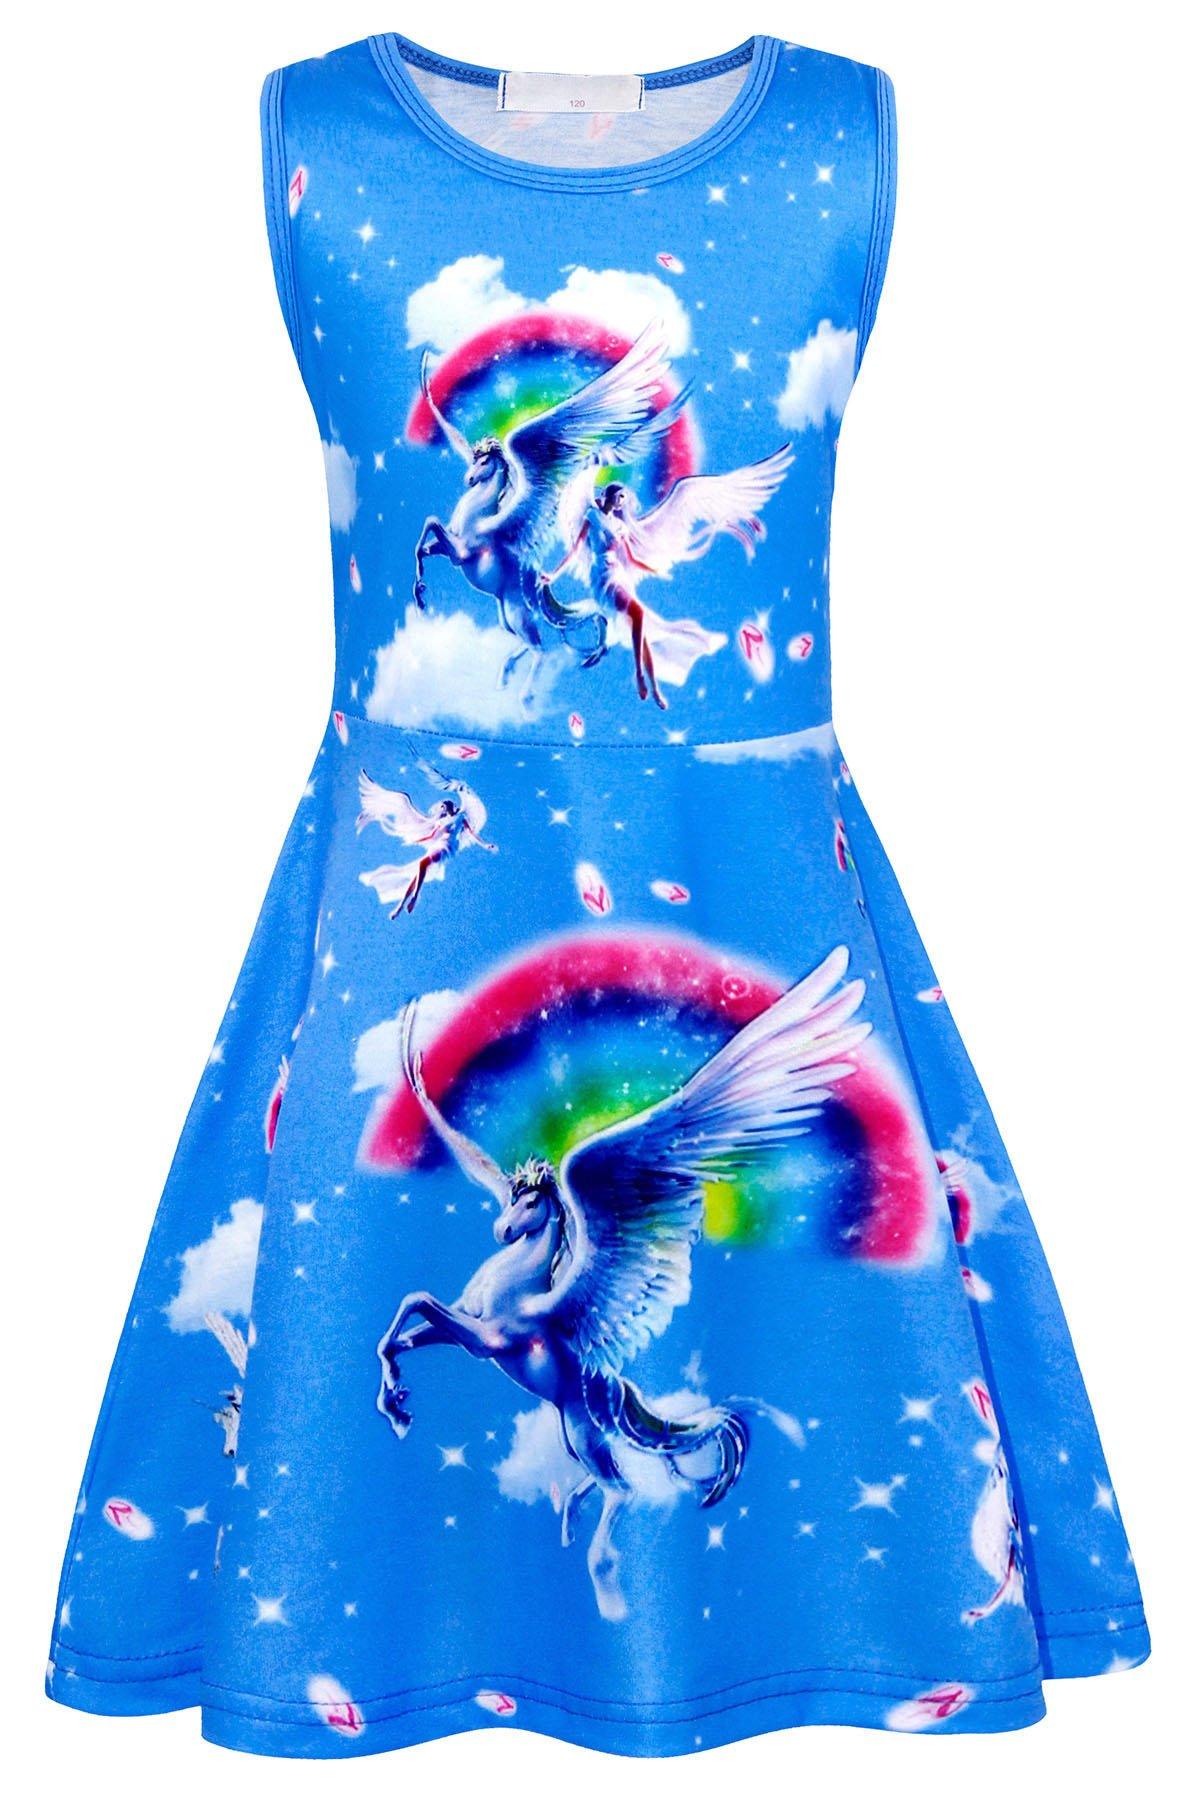 Cotrio Little Girls' Unicorn Dress Toddler Sleeveless Rainbow Birthday Theme Party Dresses Size 8 (130, 7-8Years, Blue)